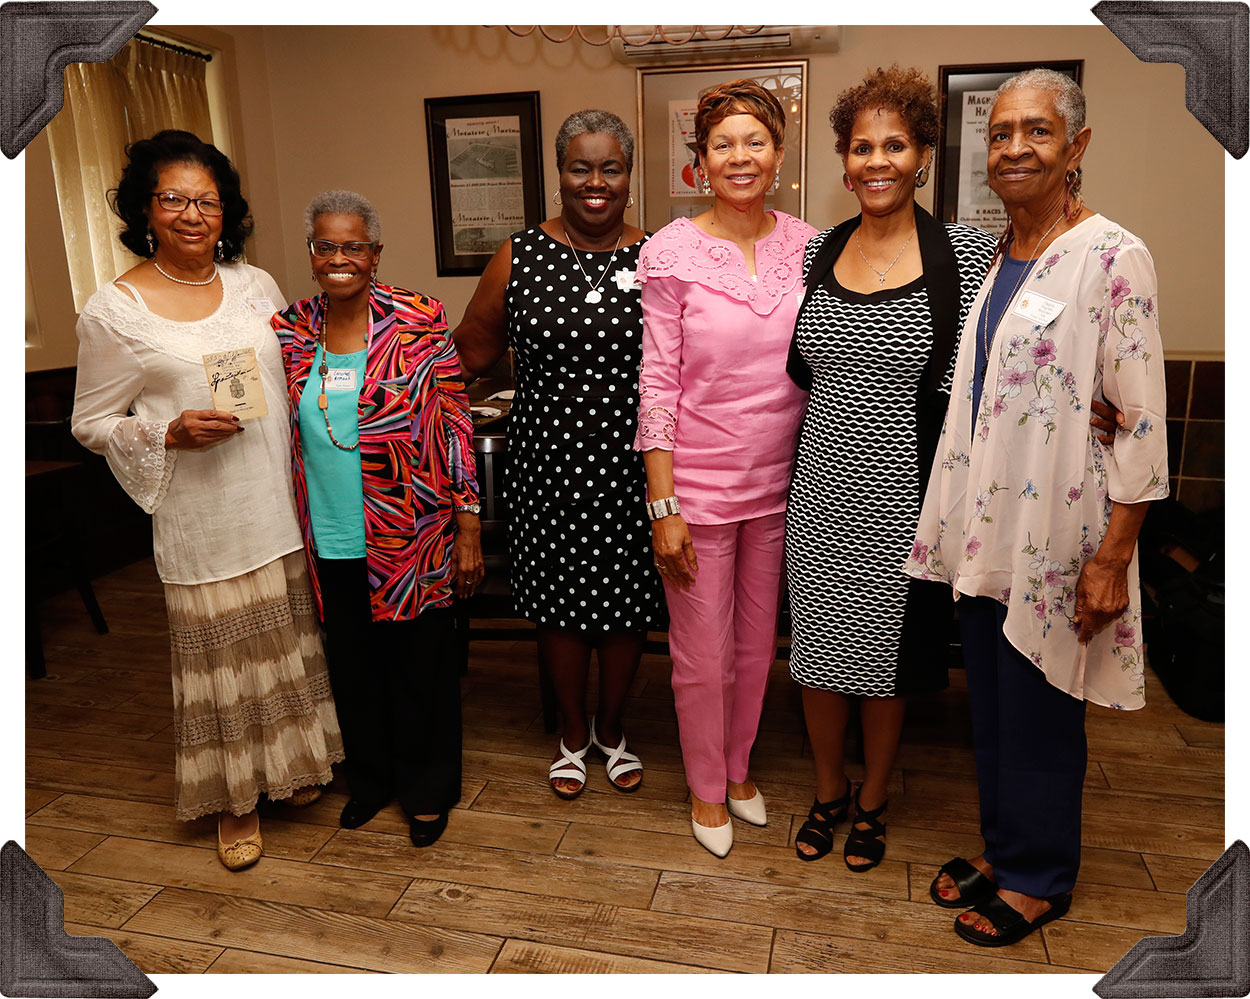 Class of '69 - Dorothy Payton, Carolyn Armant, Paulette Robertson, Shirley Rondendo, Sandra O'Neal and Debra Bodden